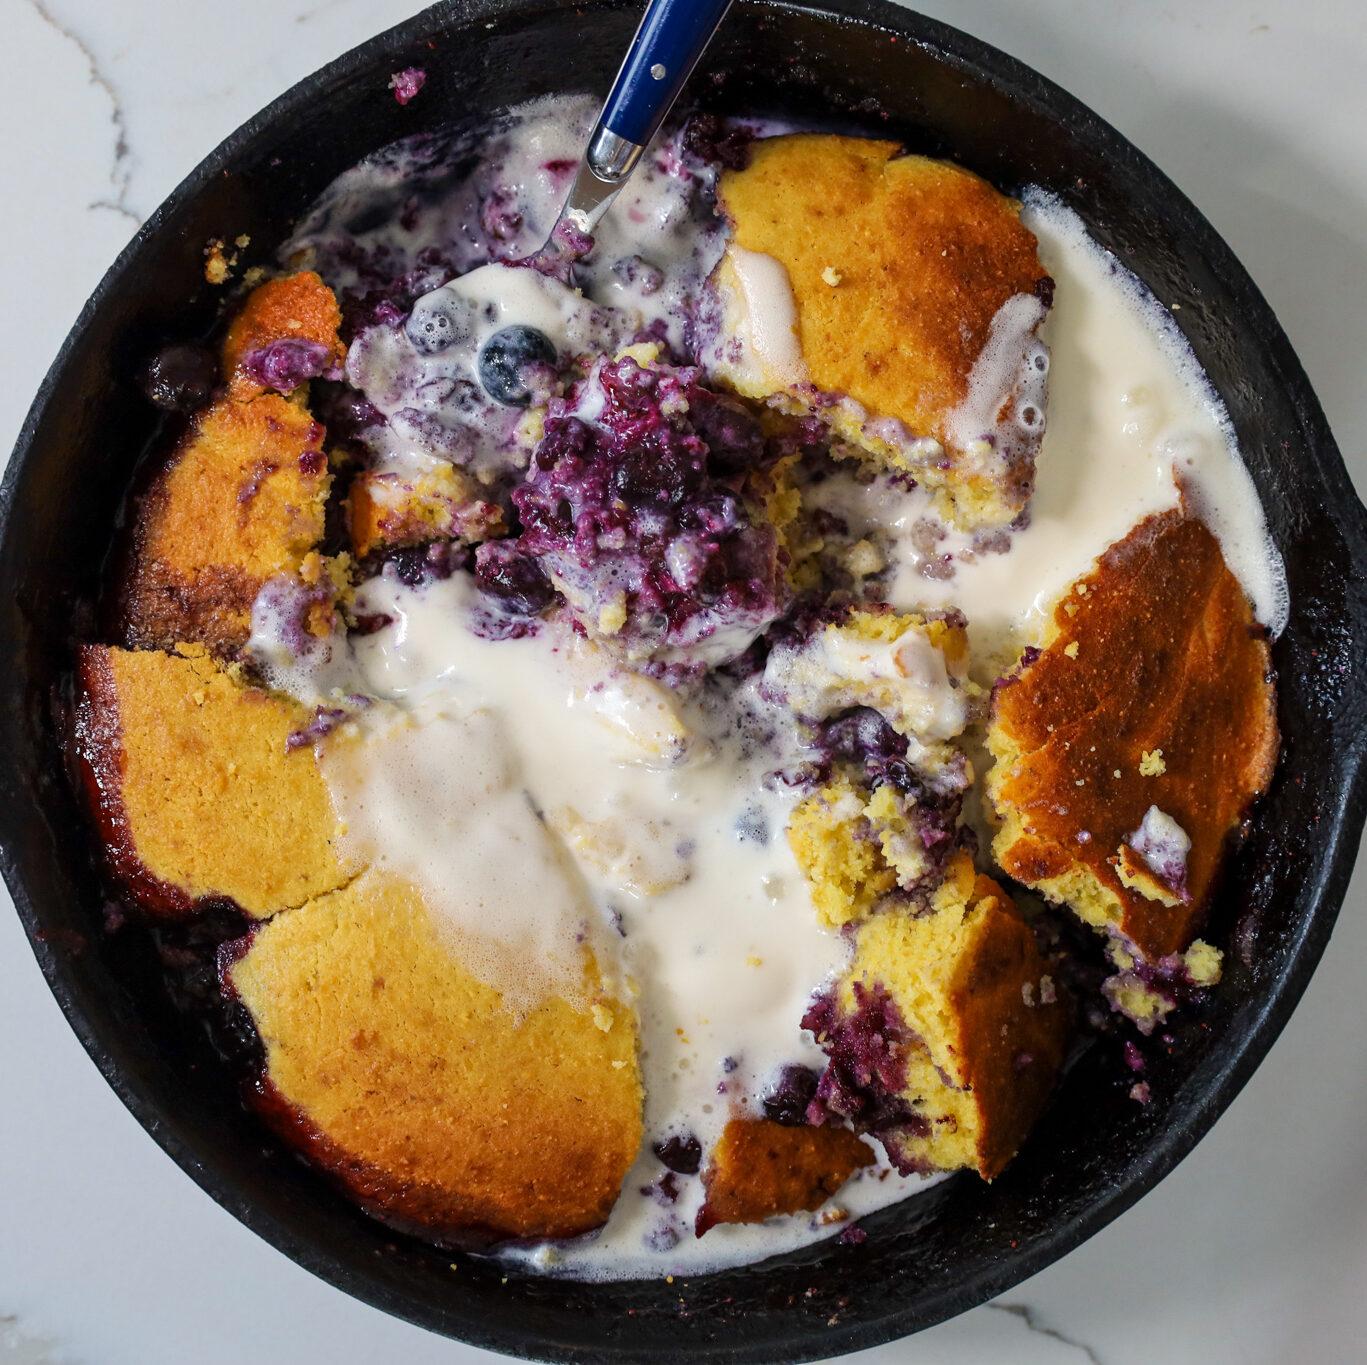 Blueberry Cornbread Cobbler with Honey Vanilla Ice Cream